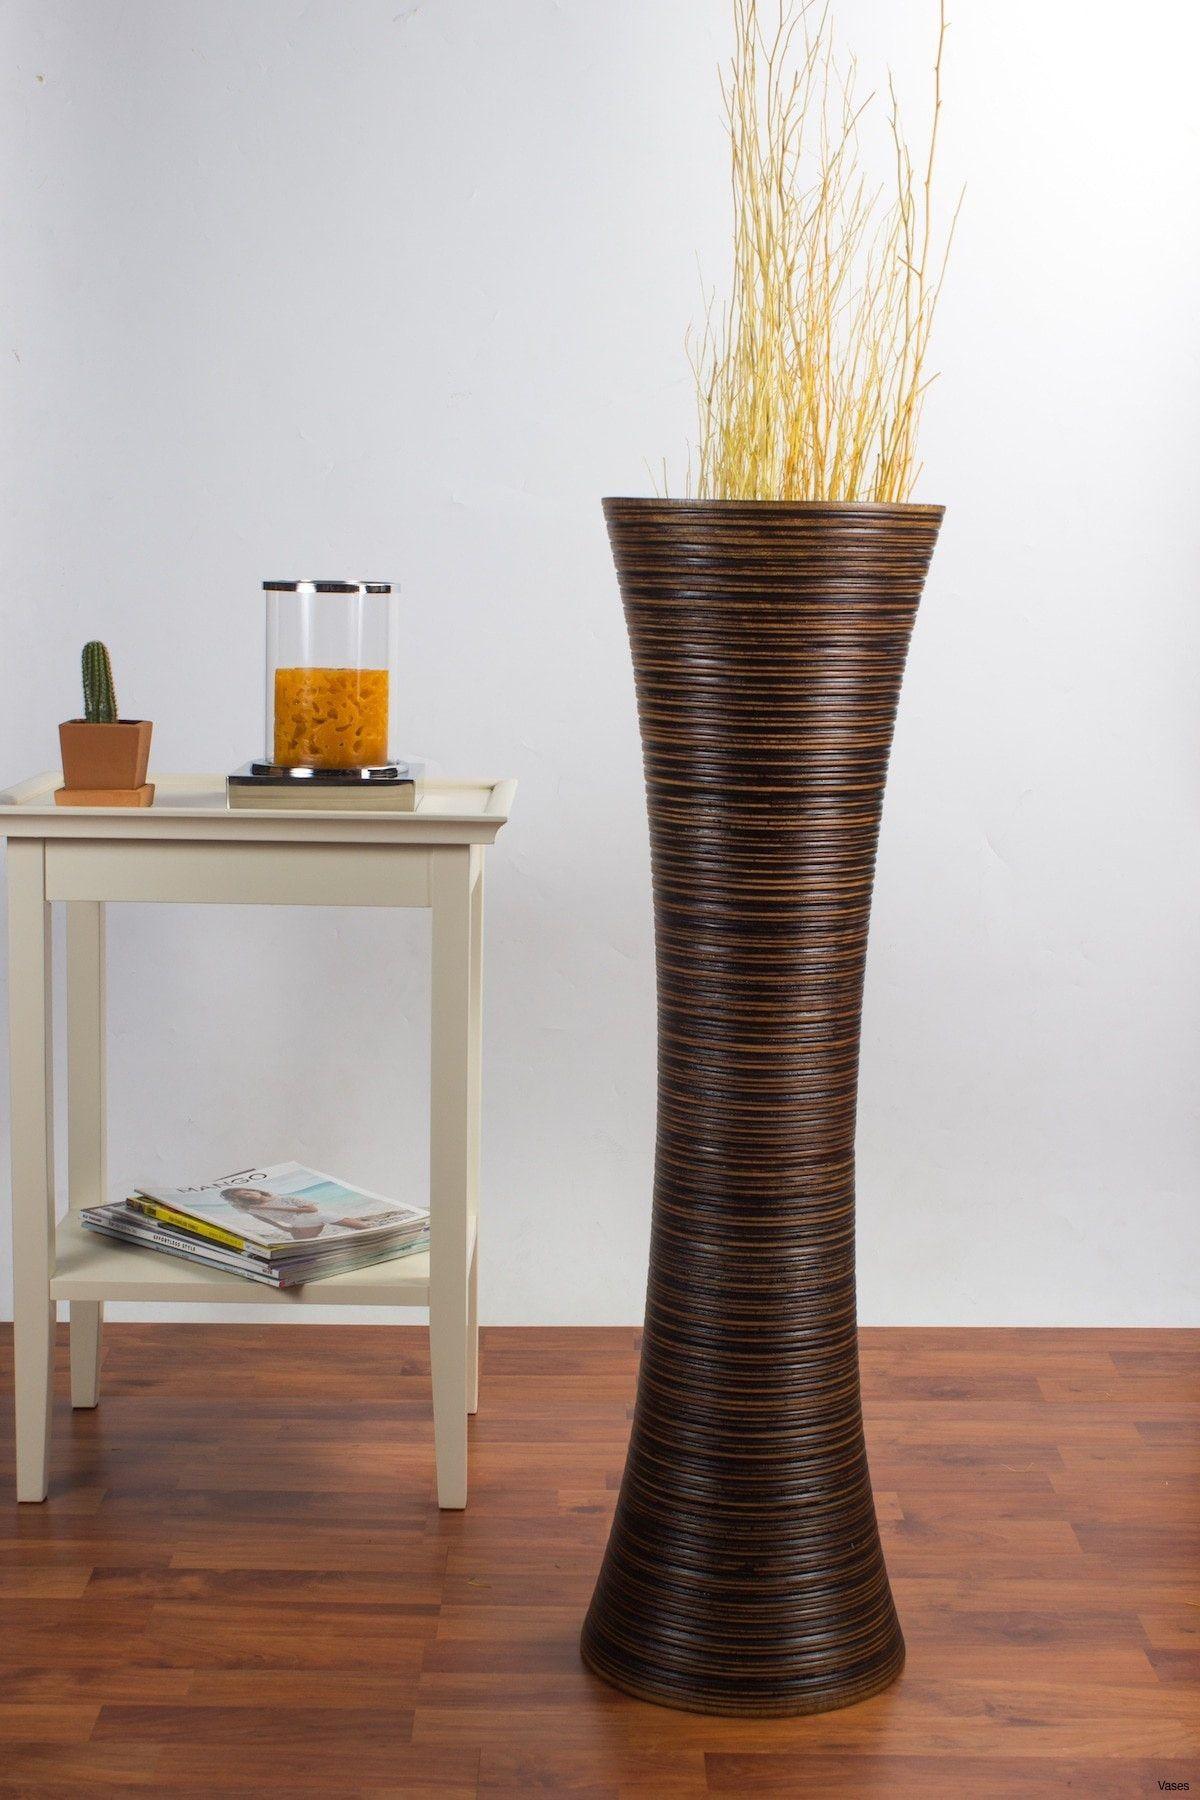 large floor vase flower arrangements of tall decorative vases luxury decorative floor vases fresh d dkbrw in tall decorative vases luxury decorative floor vases fresh d dkbrw 5749 1h vases tall brown i